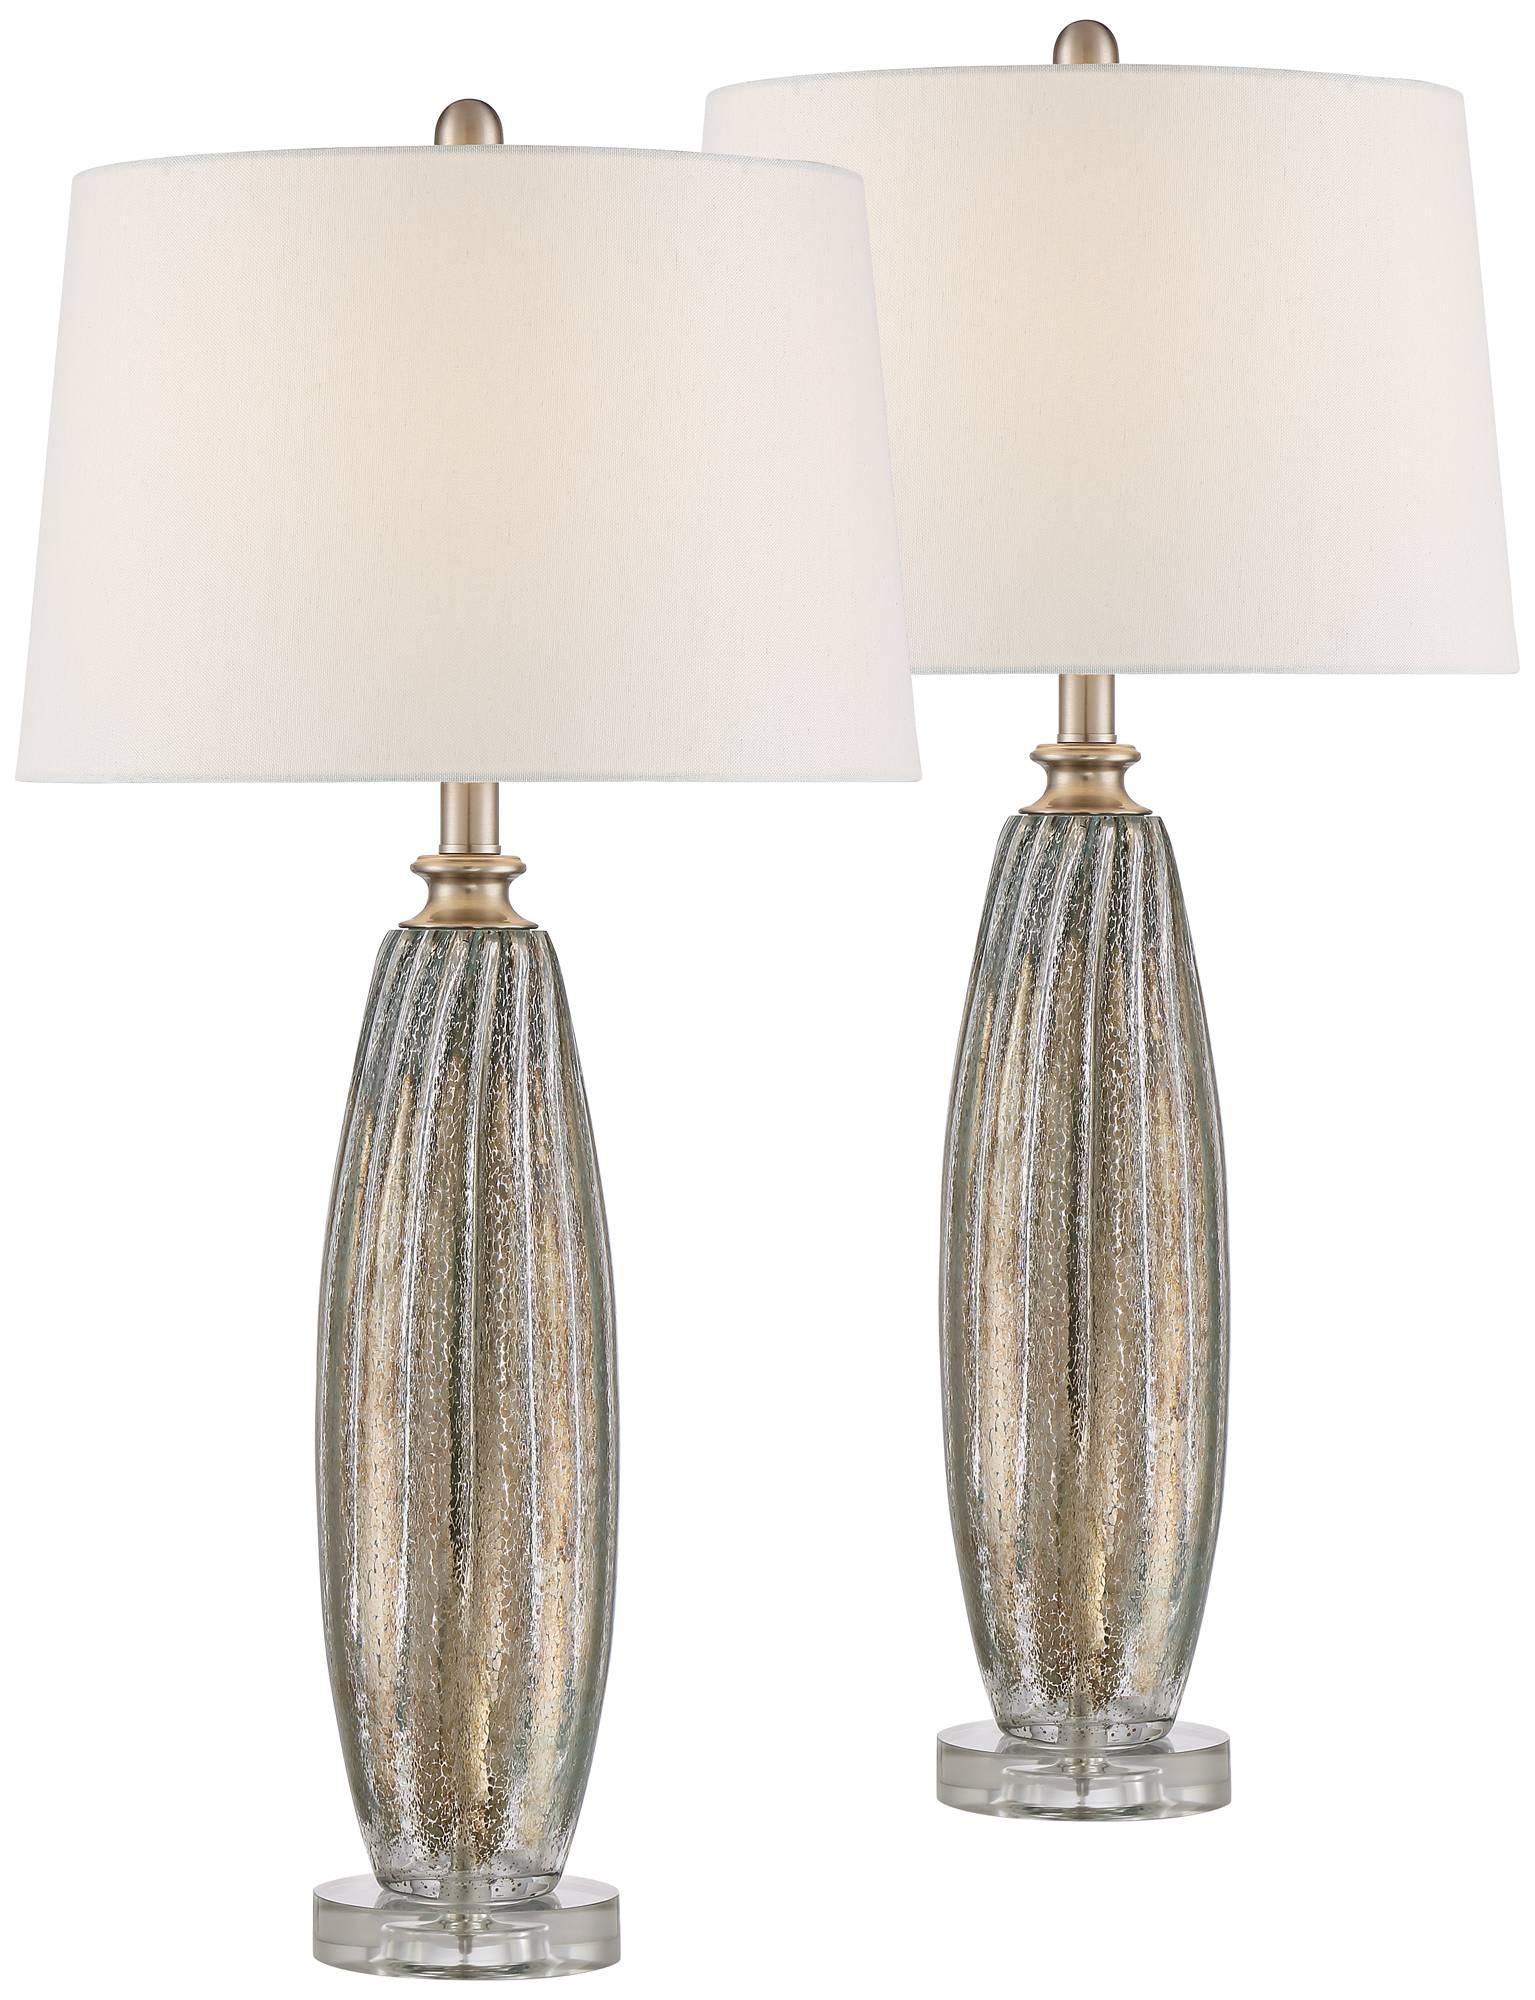 Suri champagne glass table lamp set of 2